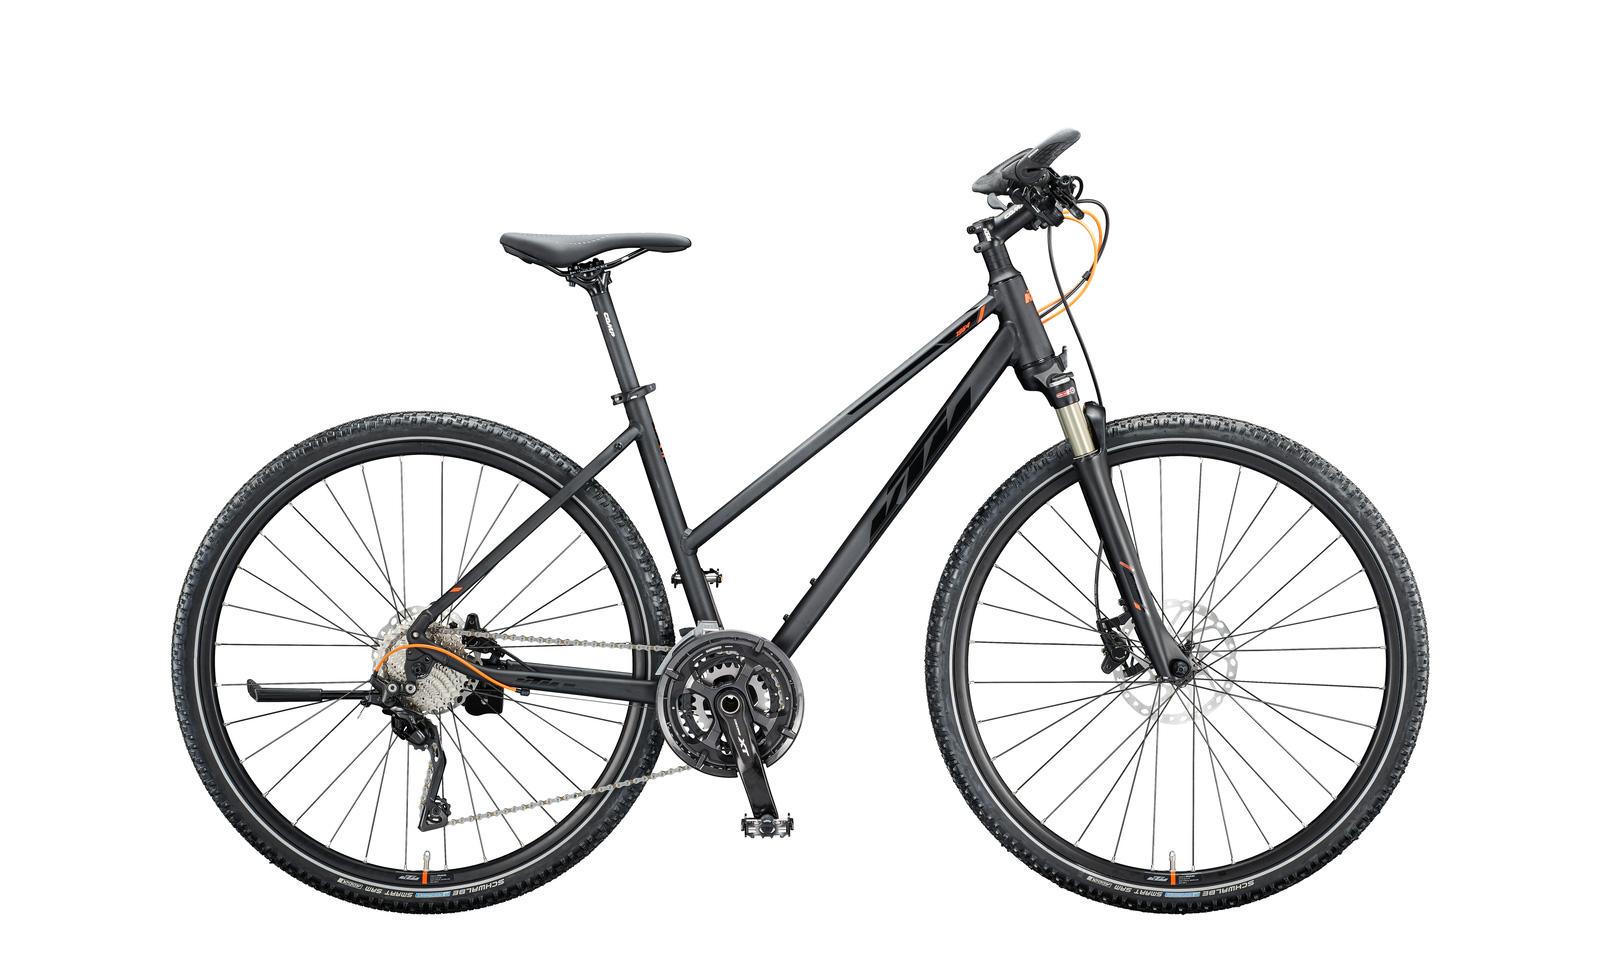 Biciclete KTM Trekking Offroad LIFE 1964 CROSS 3x10 Shimano Deore XT/Deore